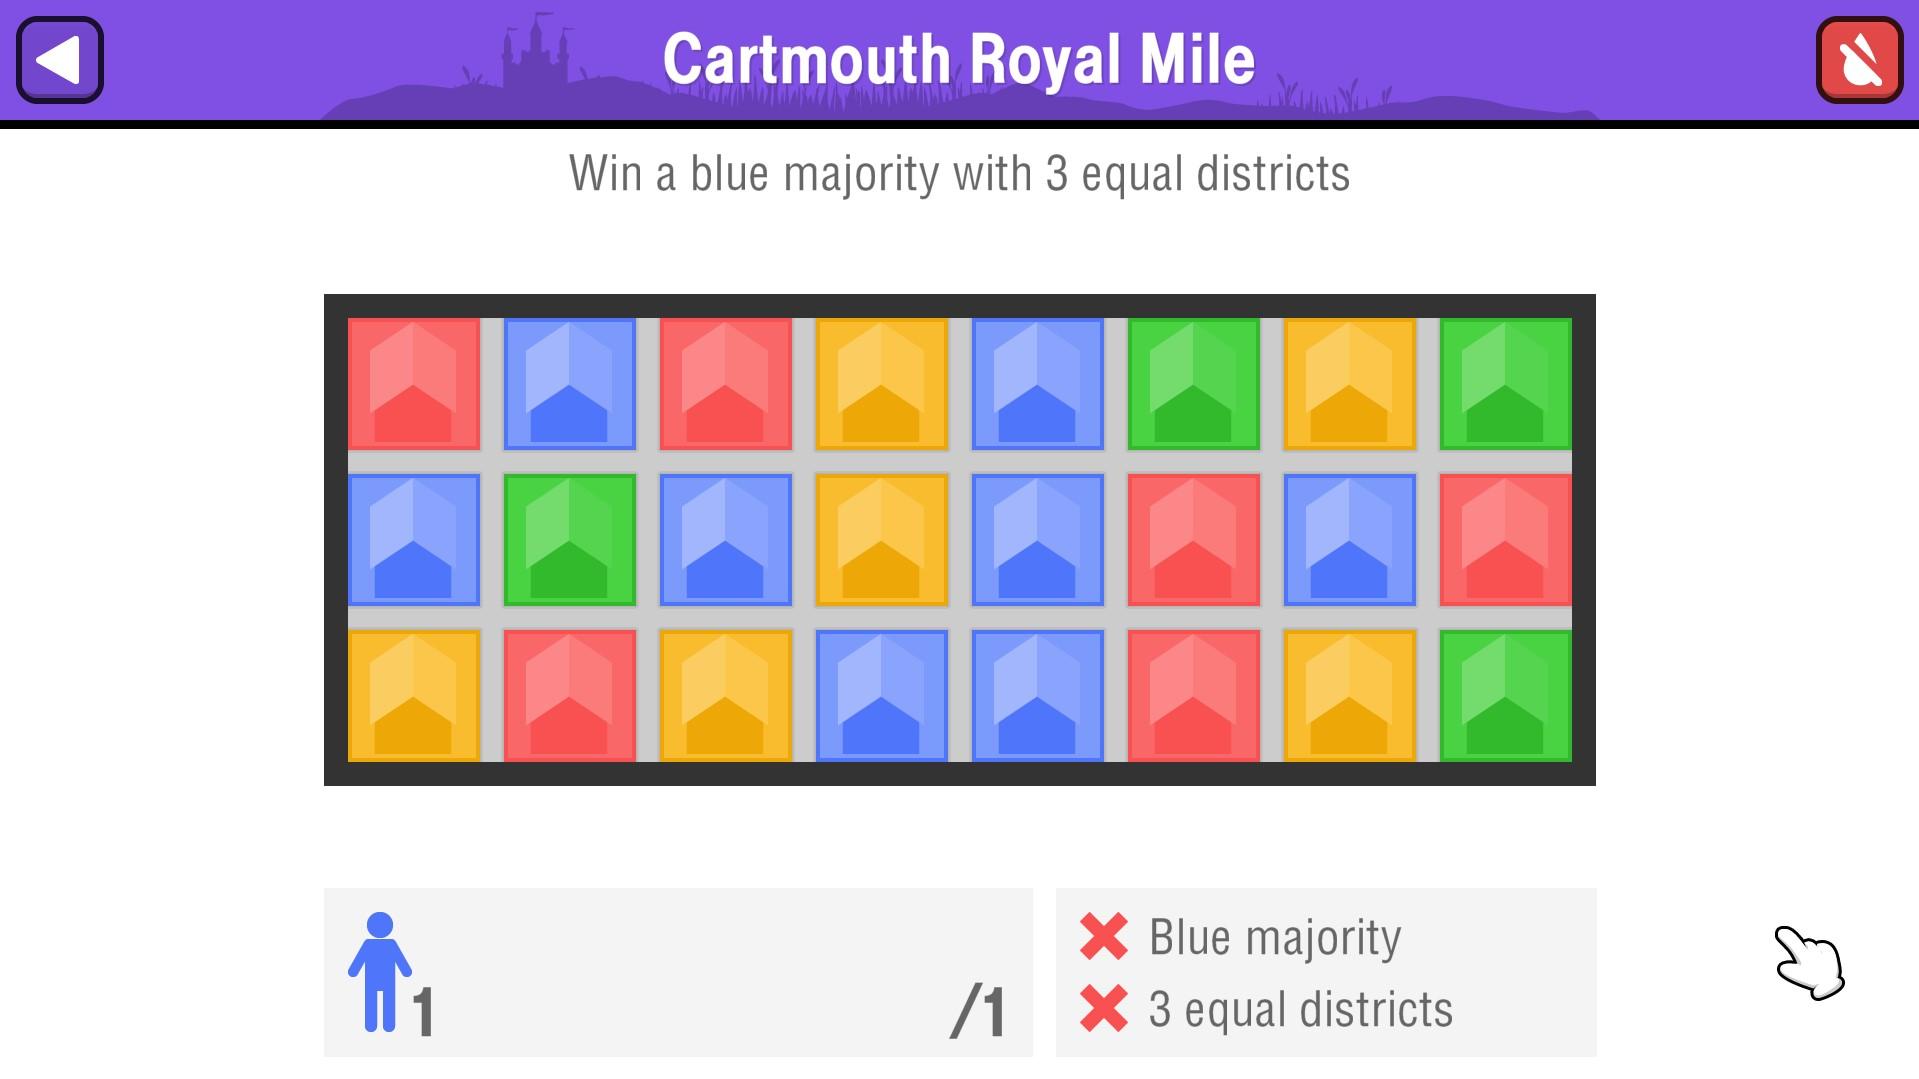 Cartmouth Royal Mile